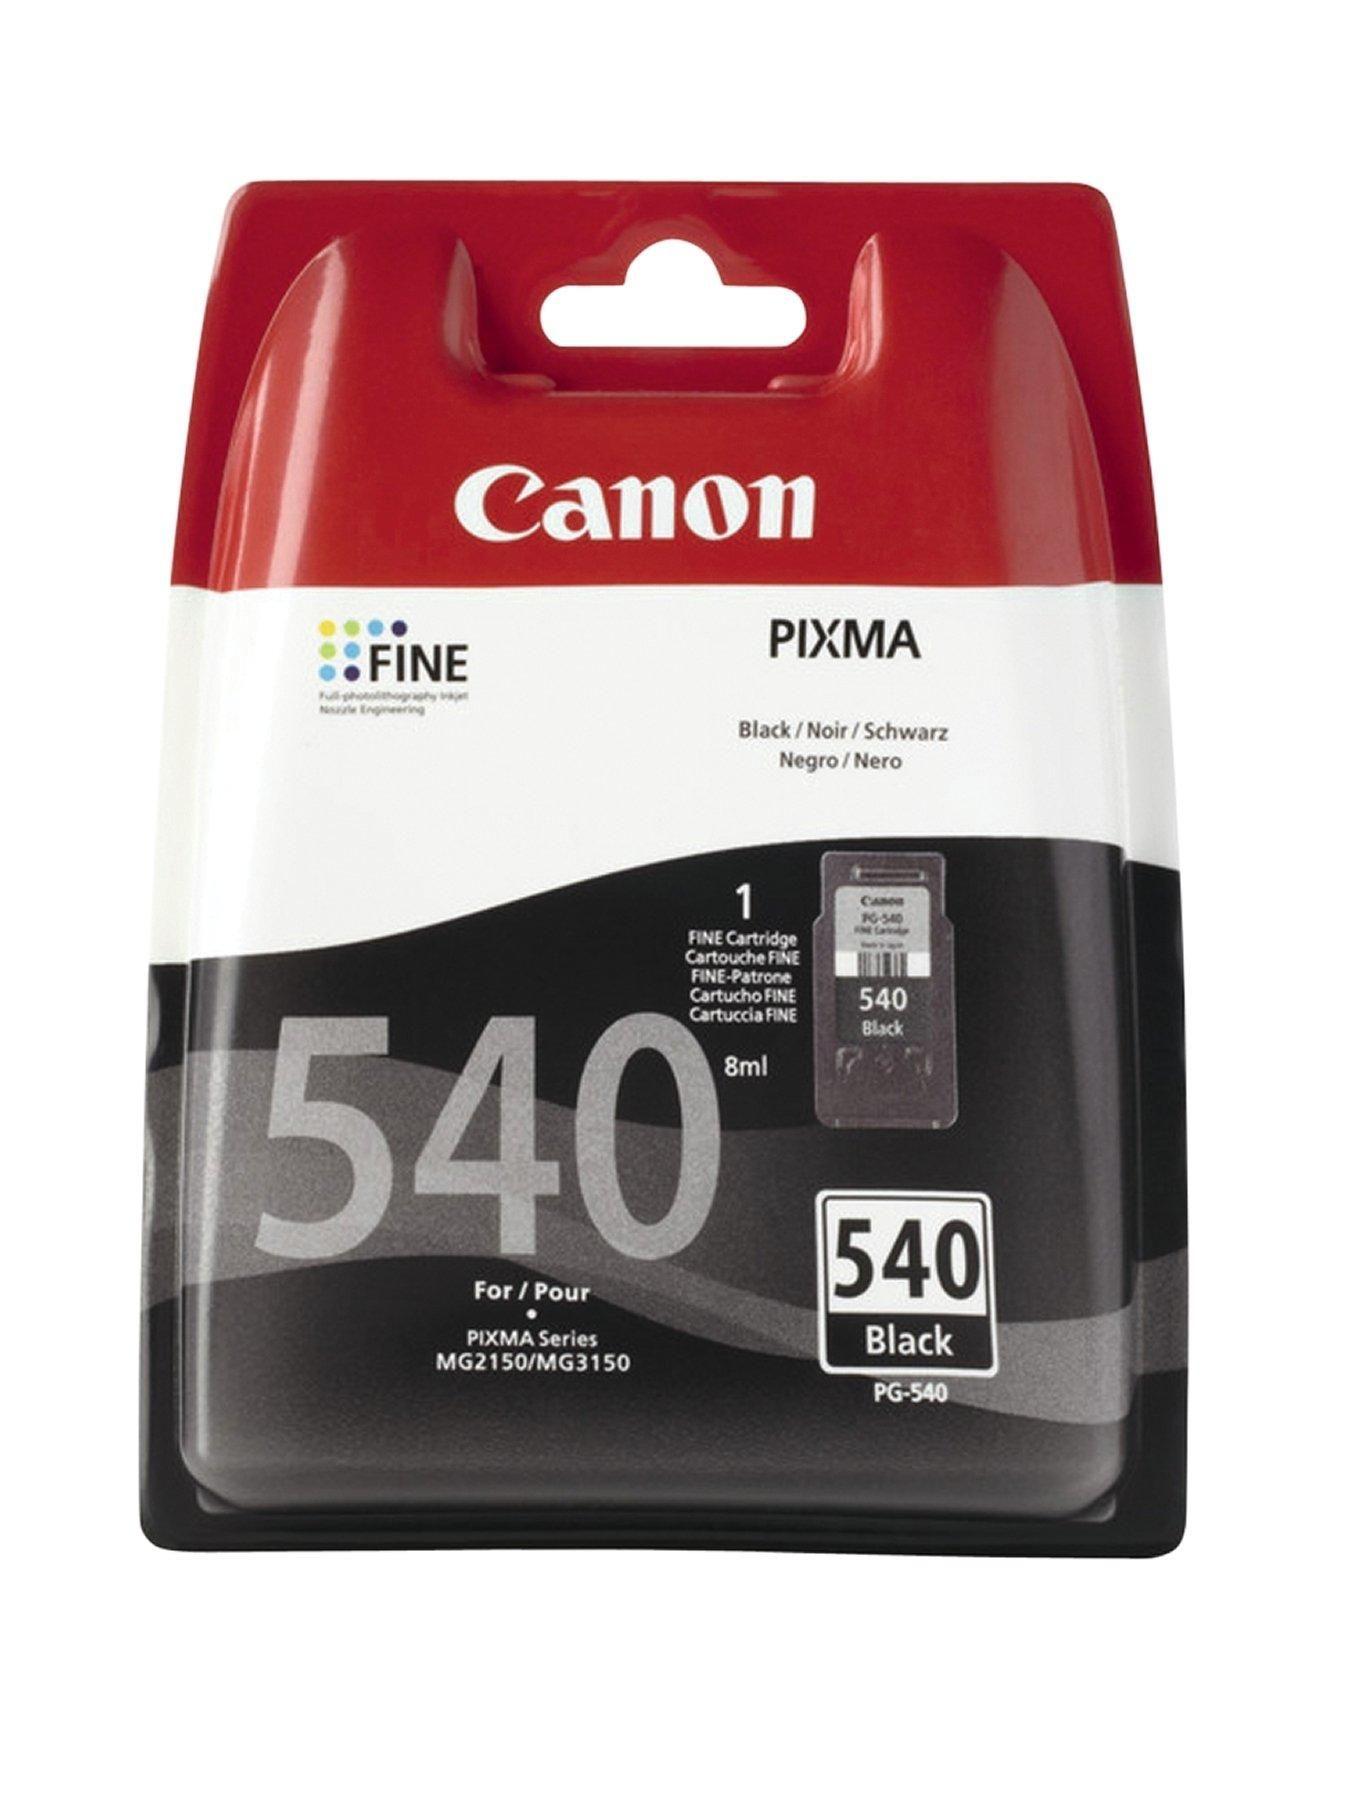 Pg 540 Black Ink Cartridge Black Ink Cartridge Ink Battery